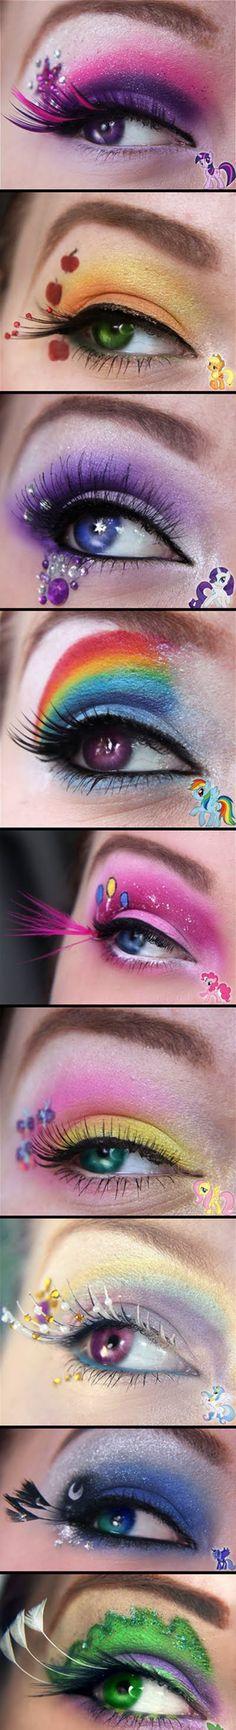 costum, rainbow dash, eye makeup, eyeshadow, twilight sparkle, princess luna, ponies, princess celestia, halloween